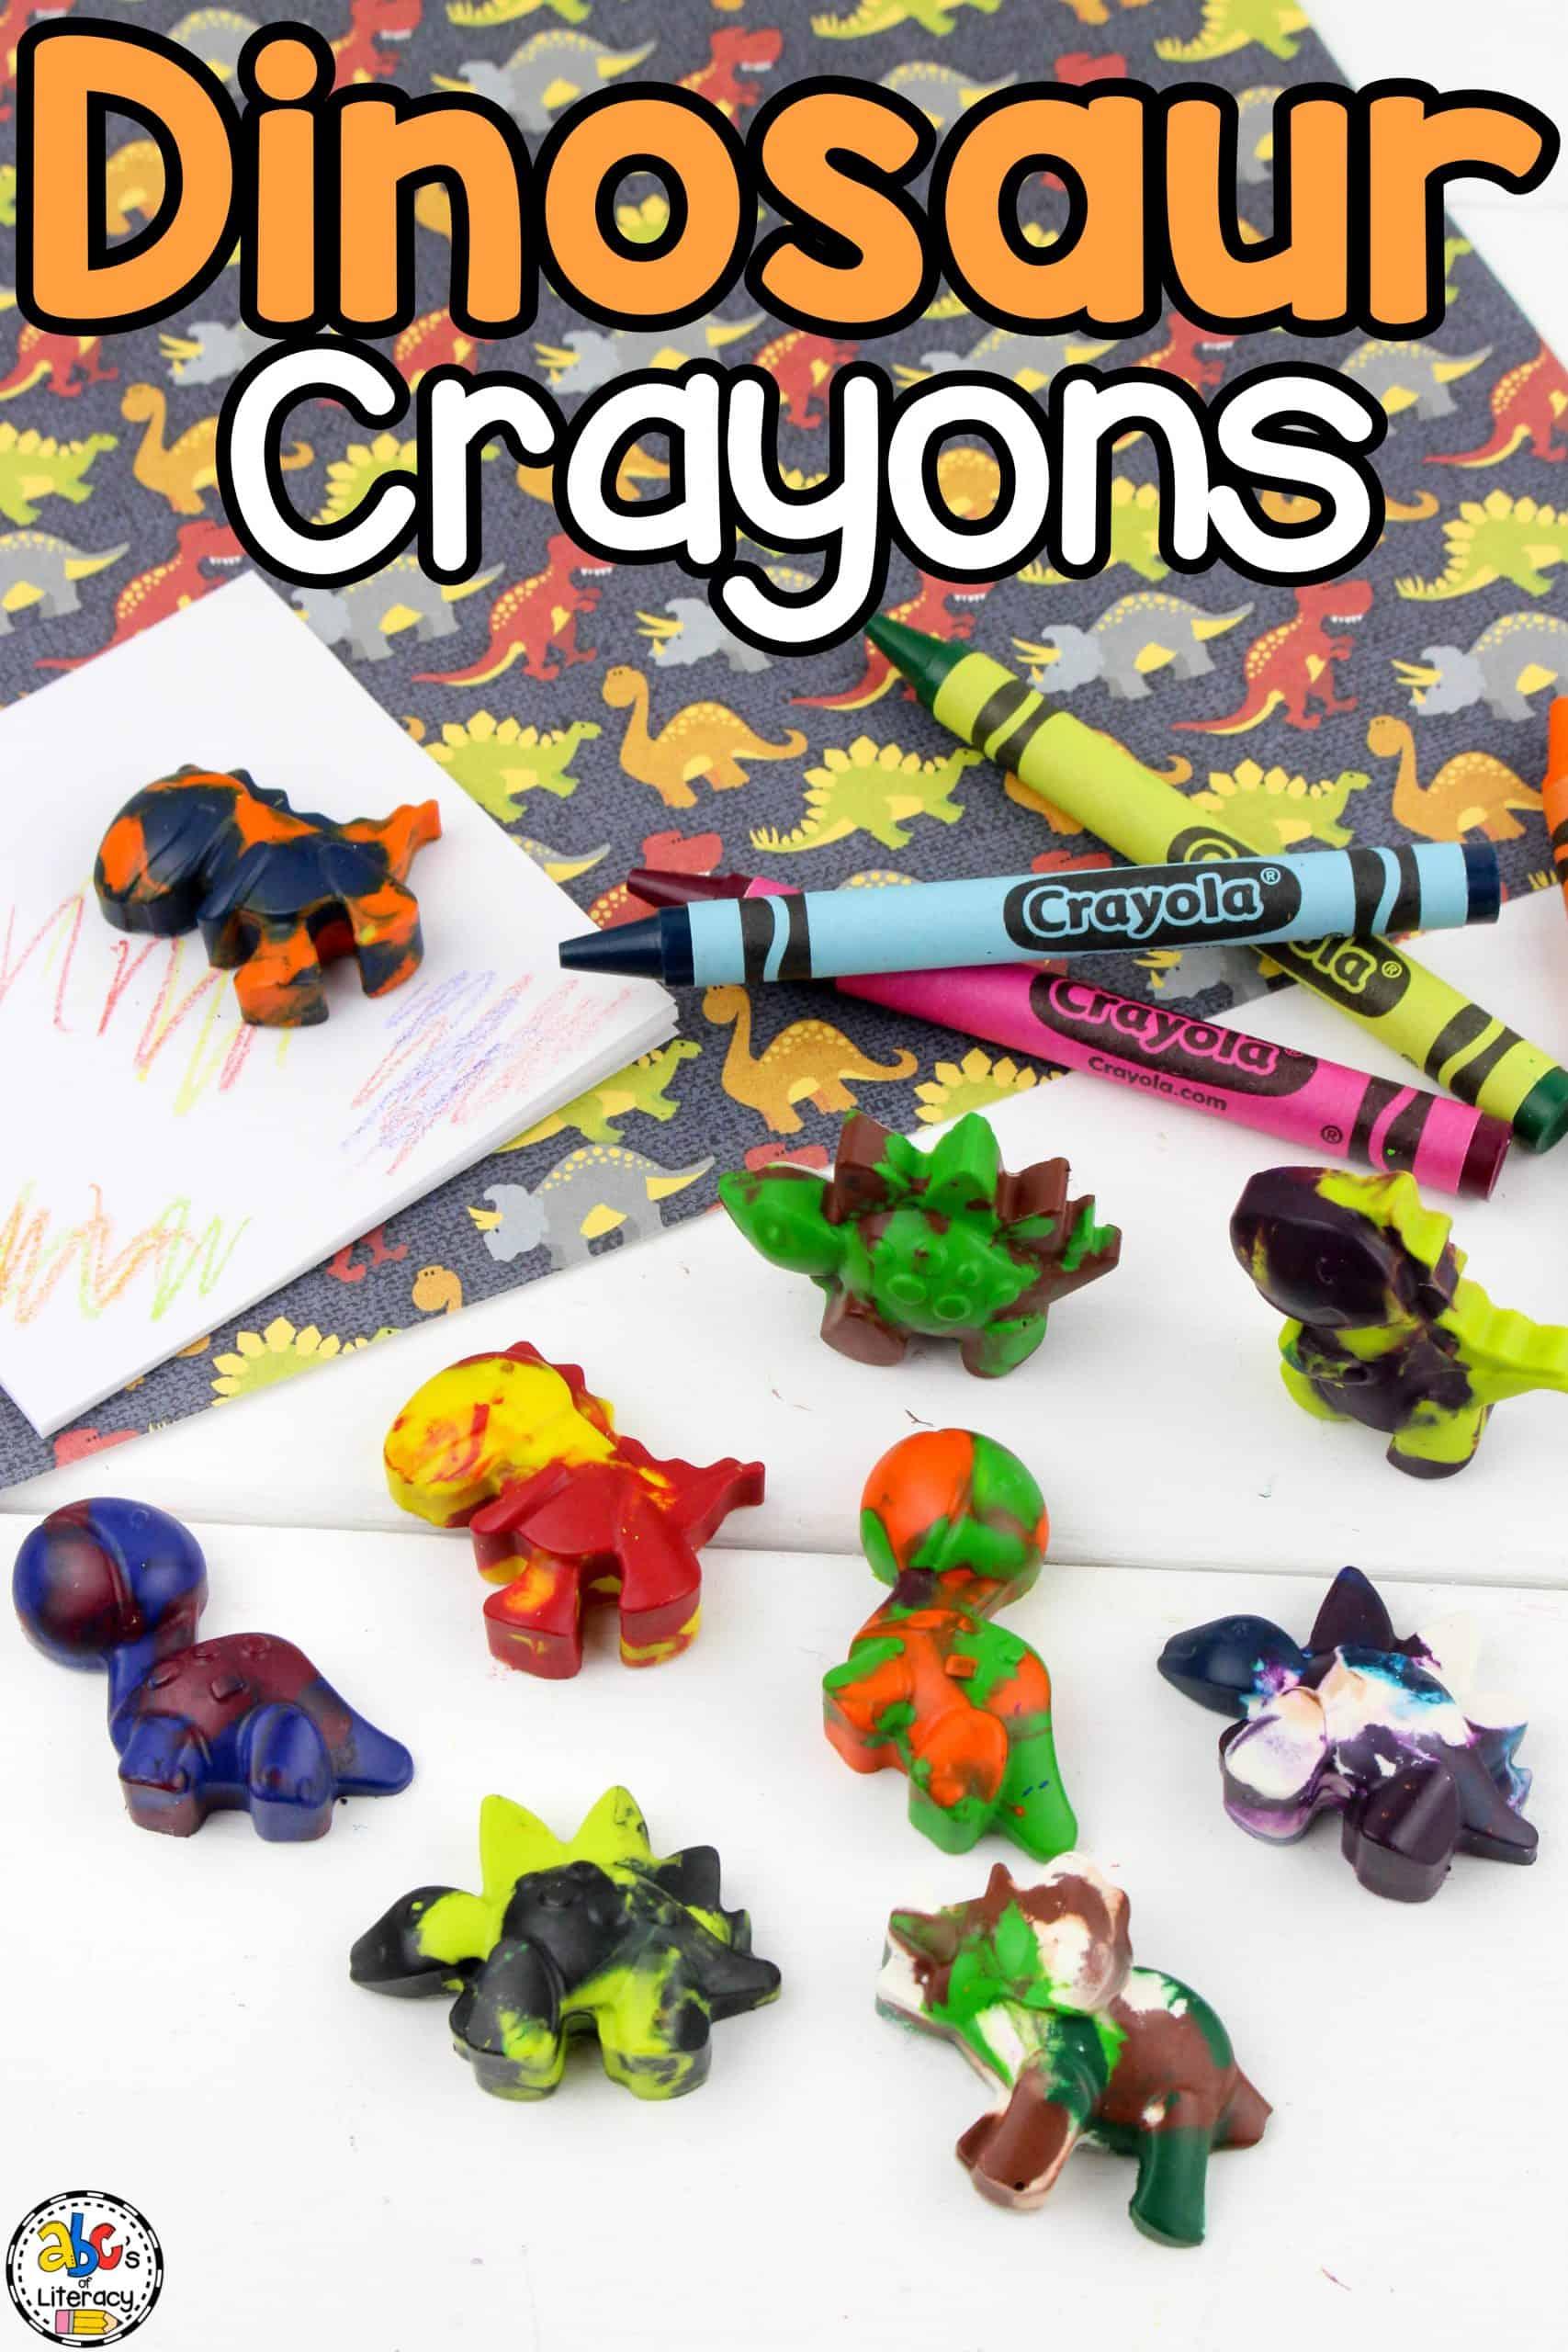 DIY Dinosaur Crayons